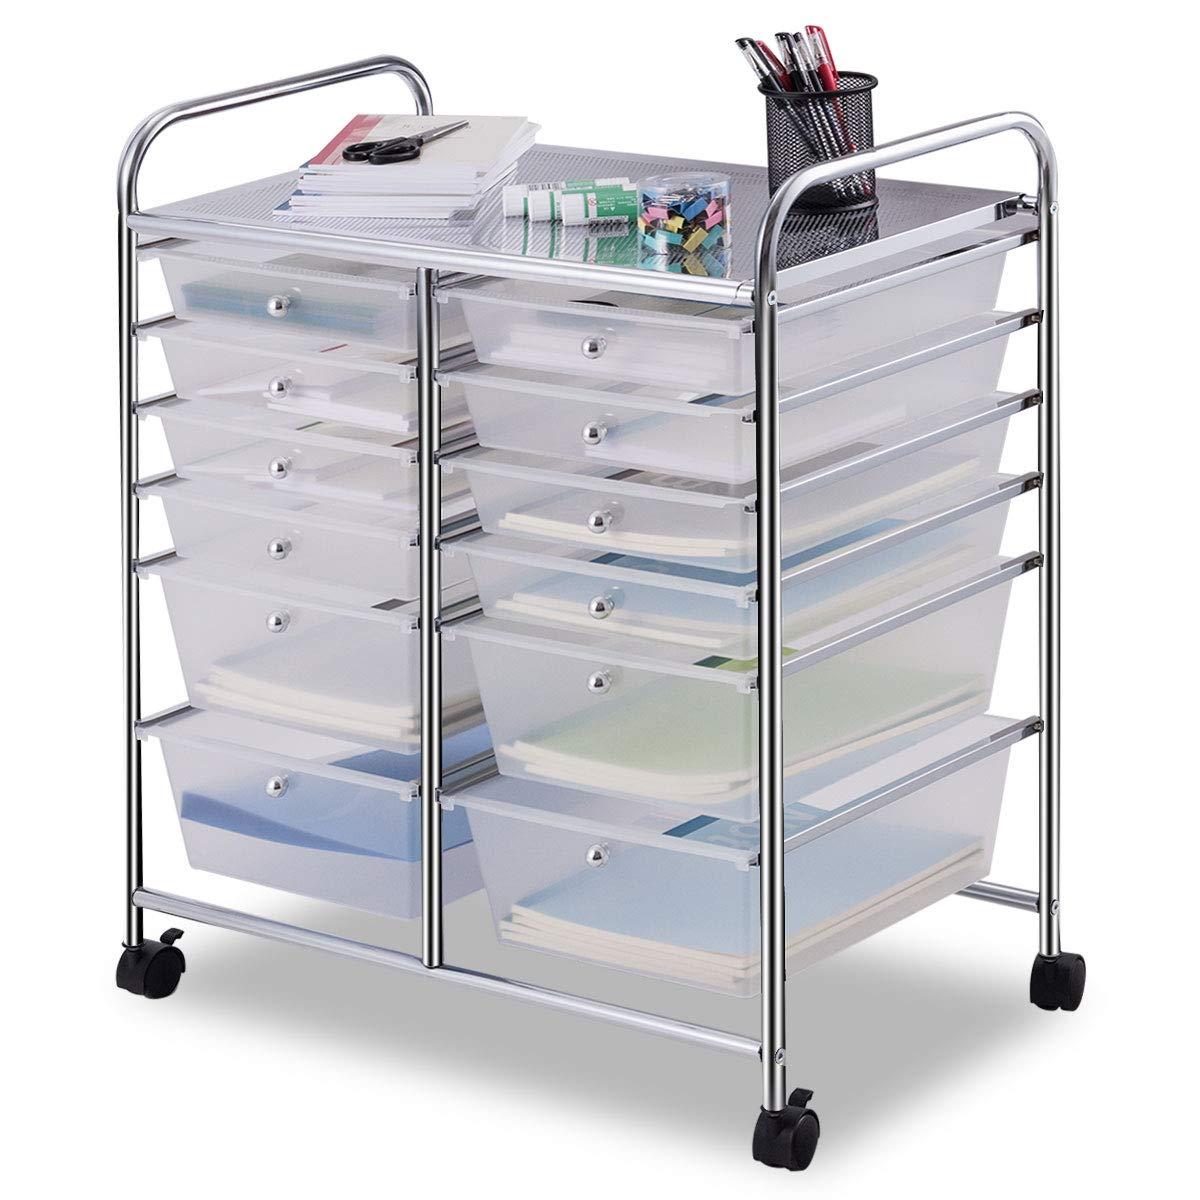 Giantex 12 Drawer Rolling Storage Cart Tools Scrapbook Paper Office School Organizer (White) by Giantex